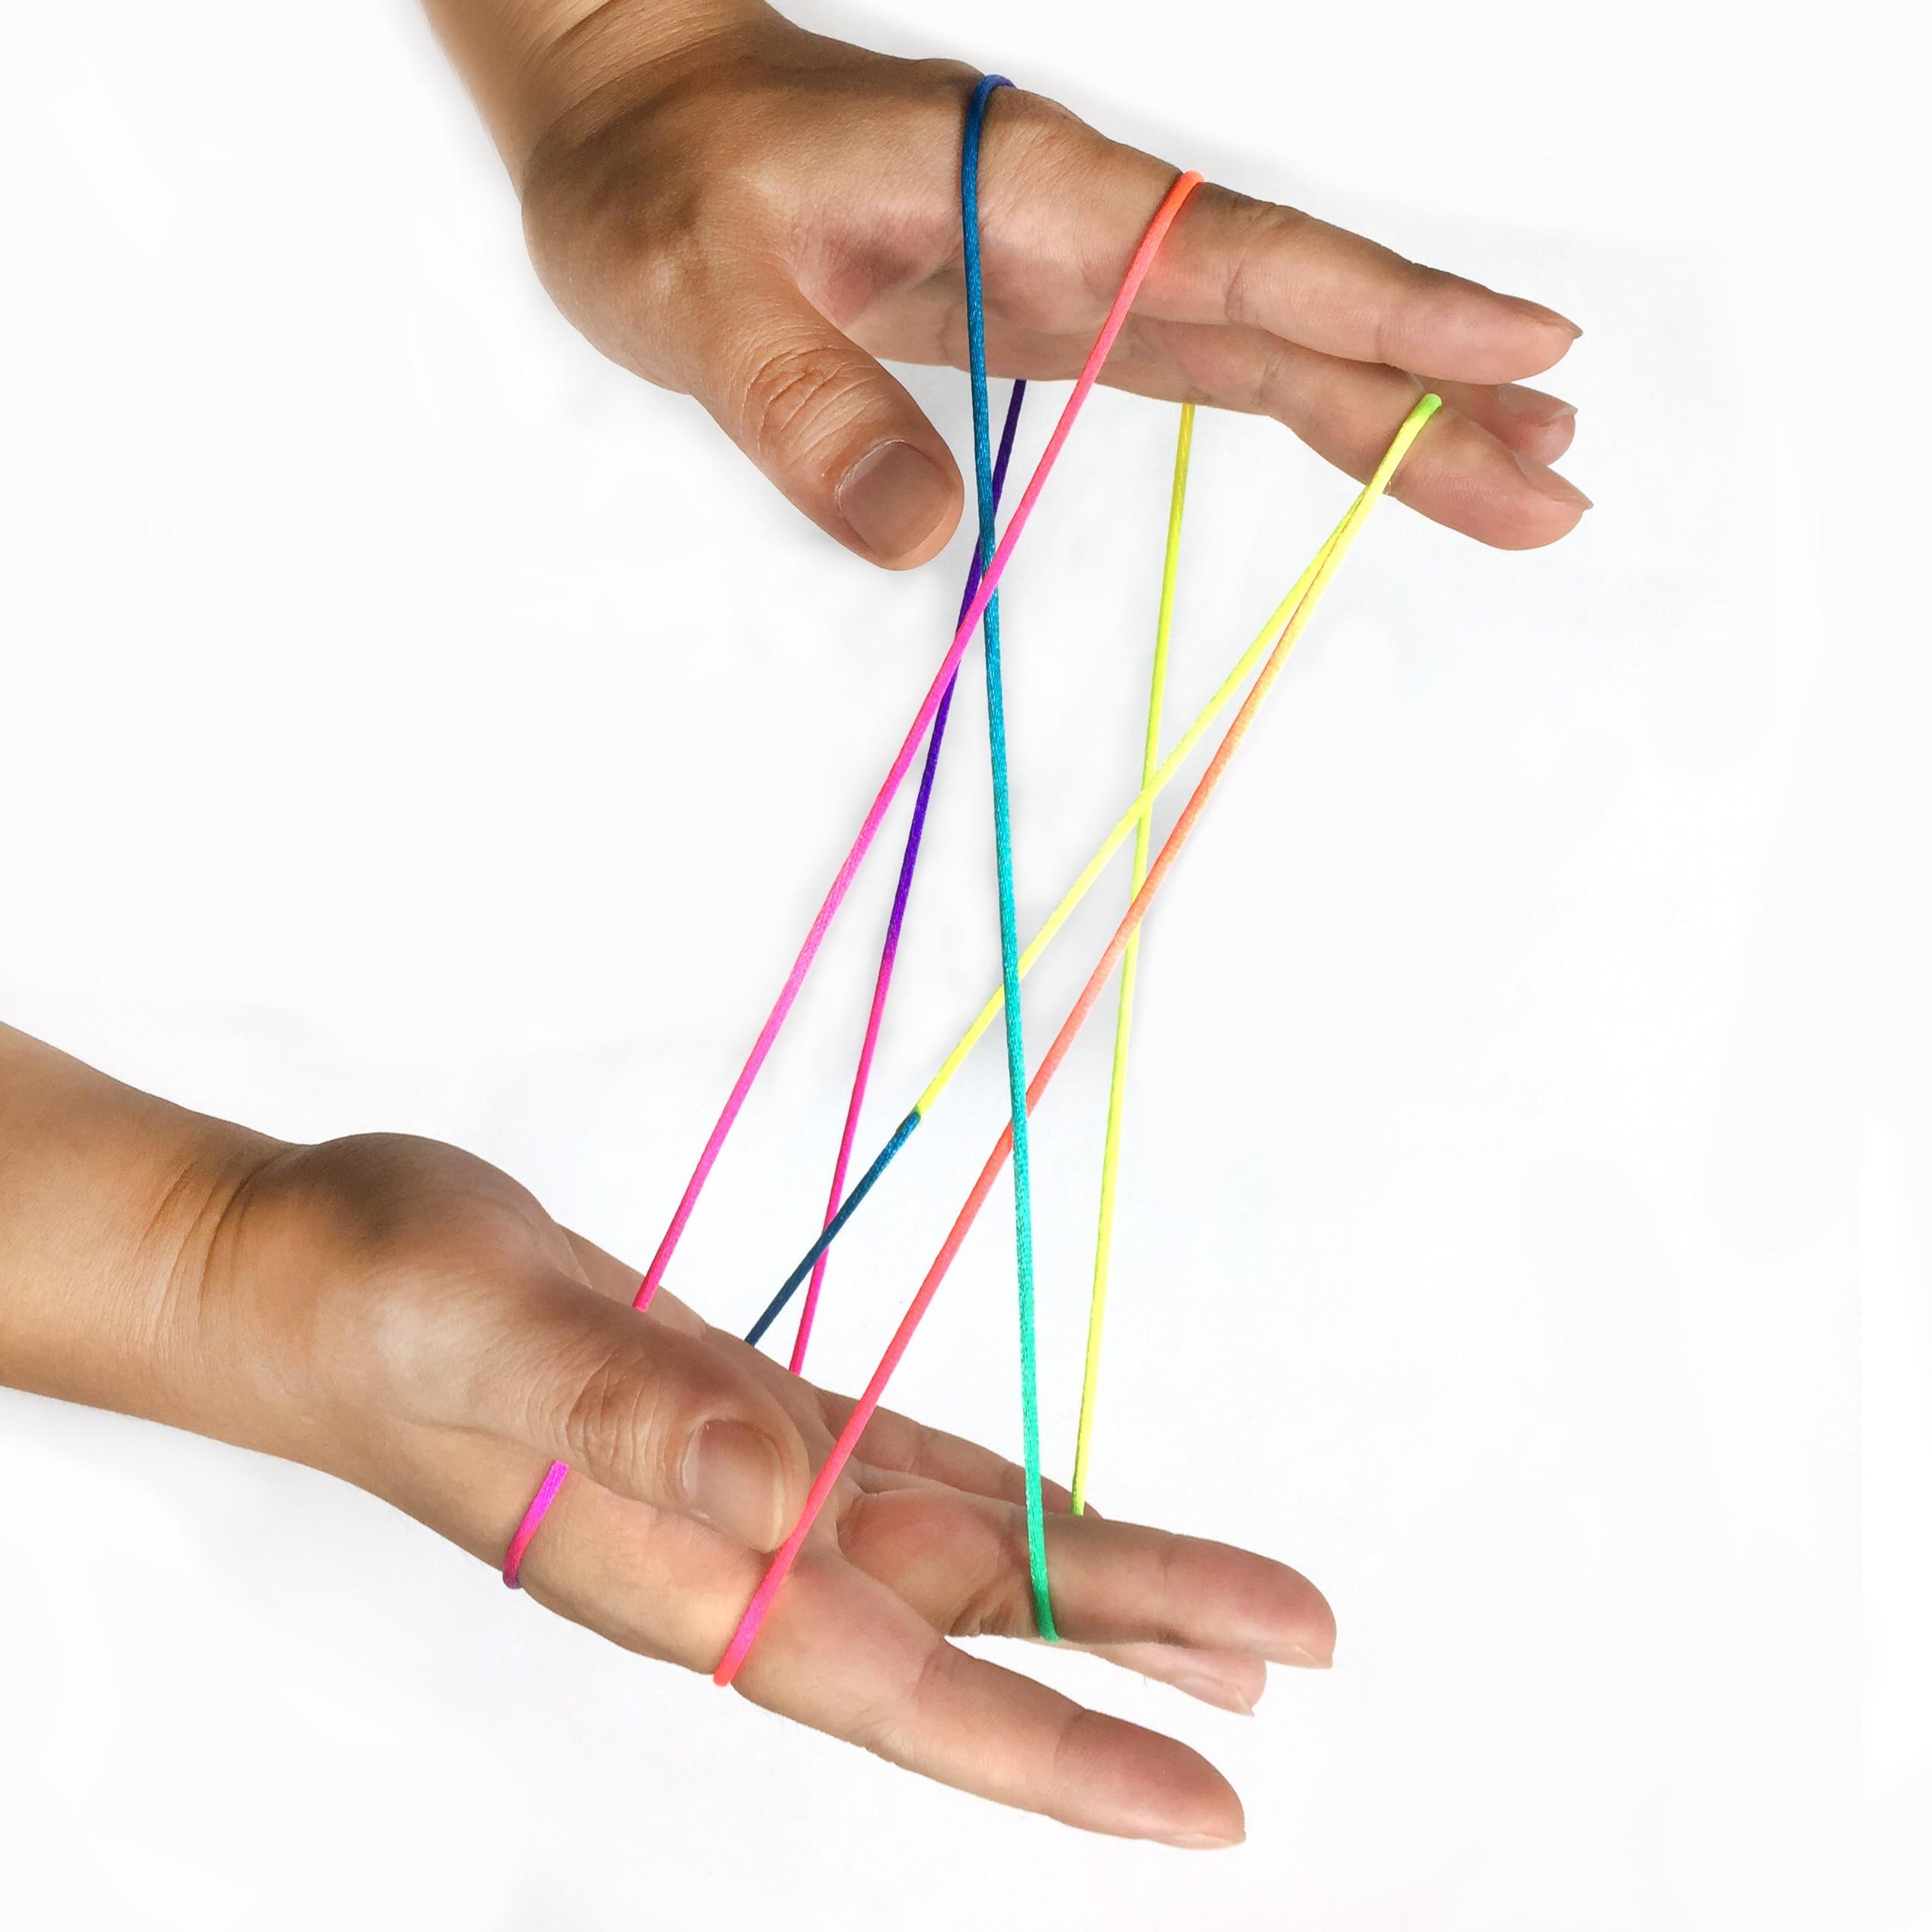 ztringz rainbow loom toys for girls brinquedos menina children de menina zabawki dla dzieci artesanato elastic bands for weaving